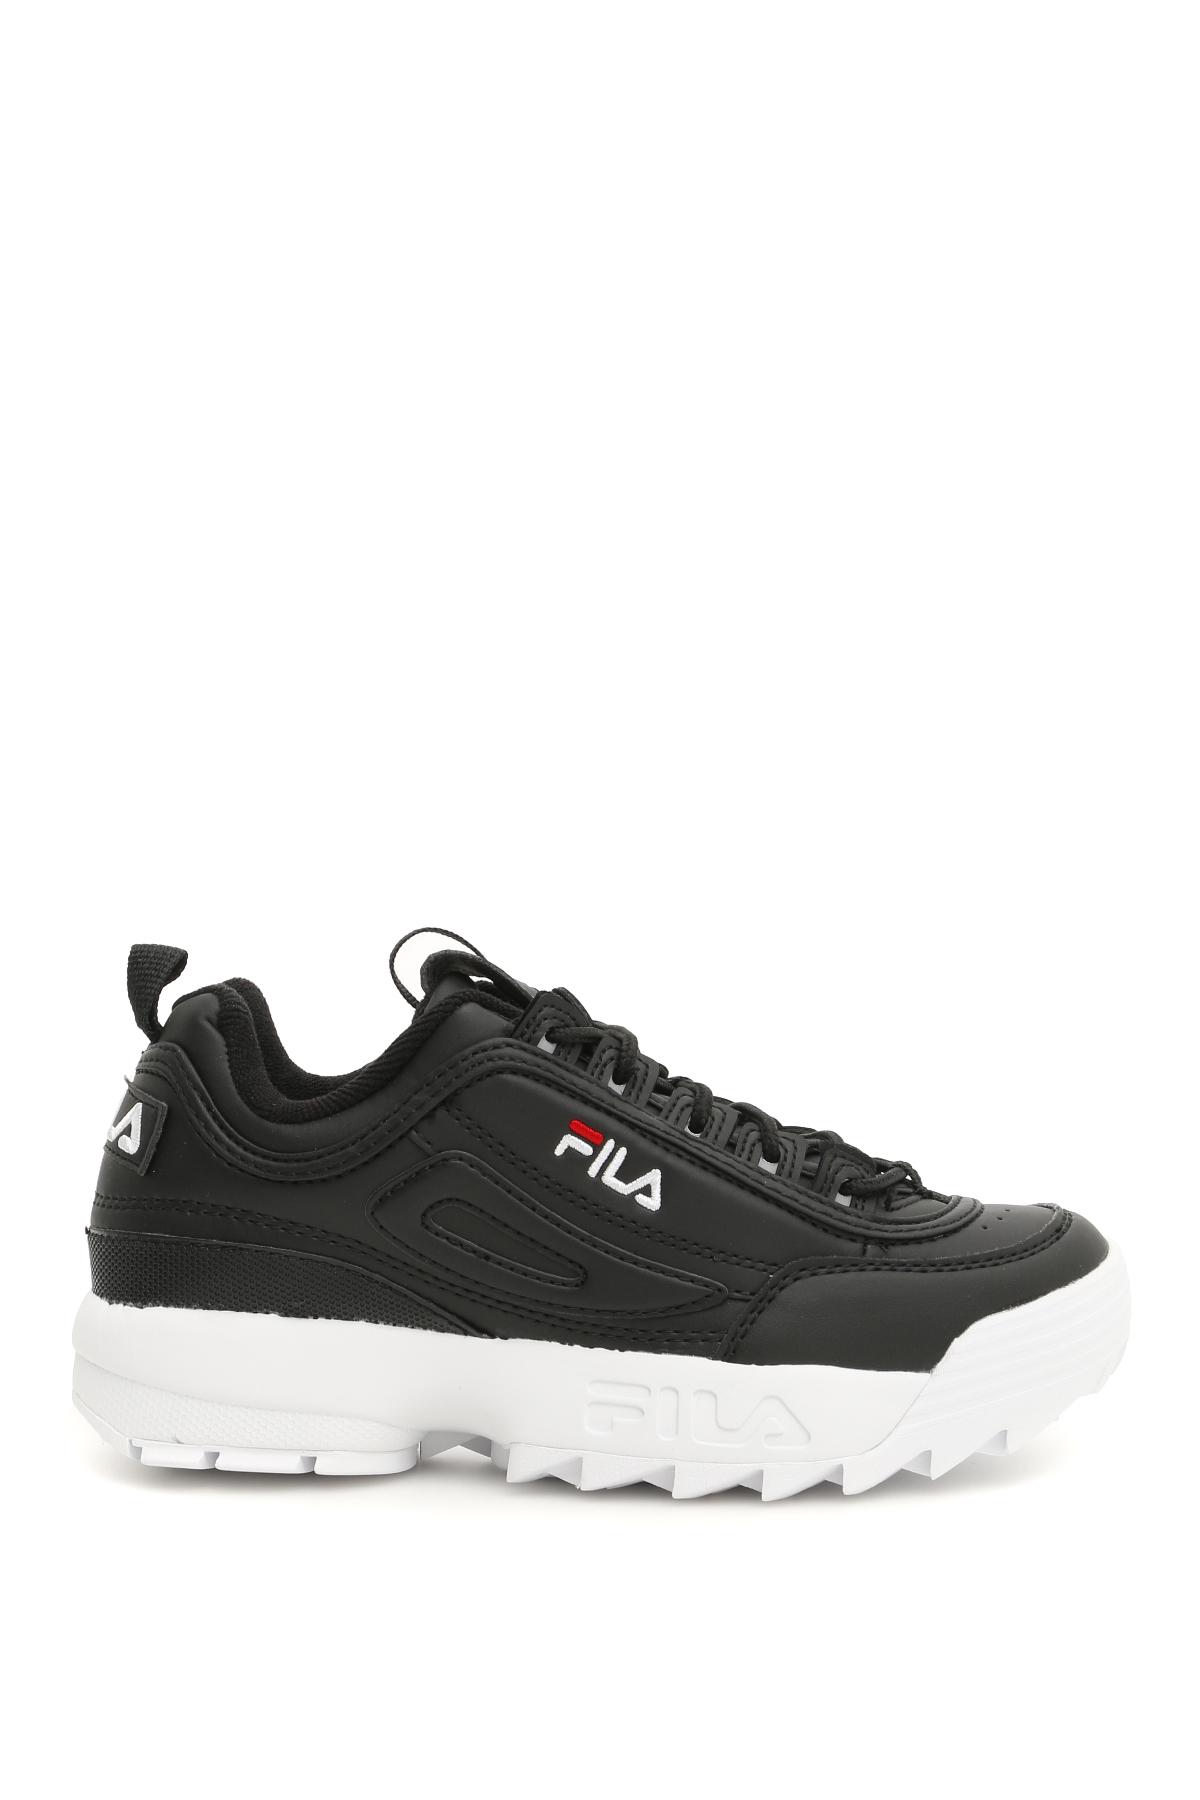 FILA DISRUPTOR LOW SNEAKERS 9 Black, White Faux leather